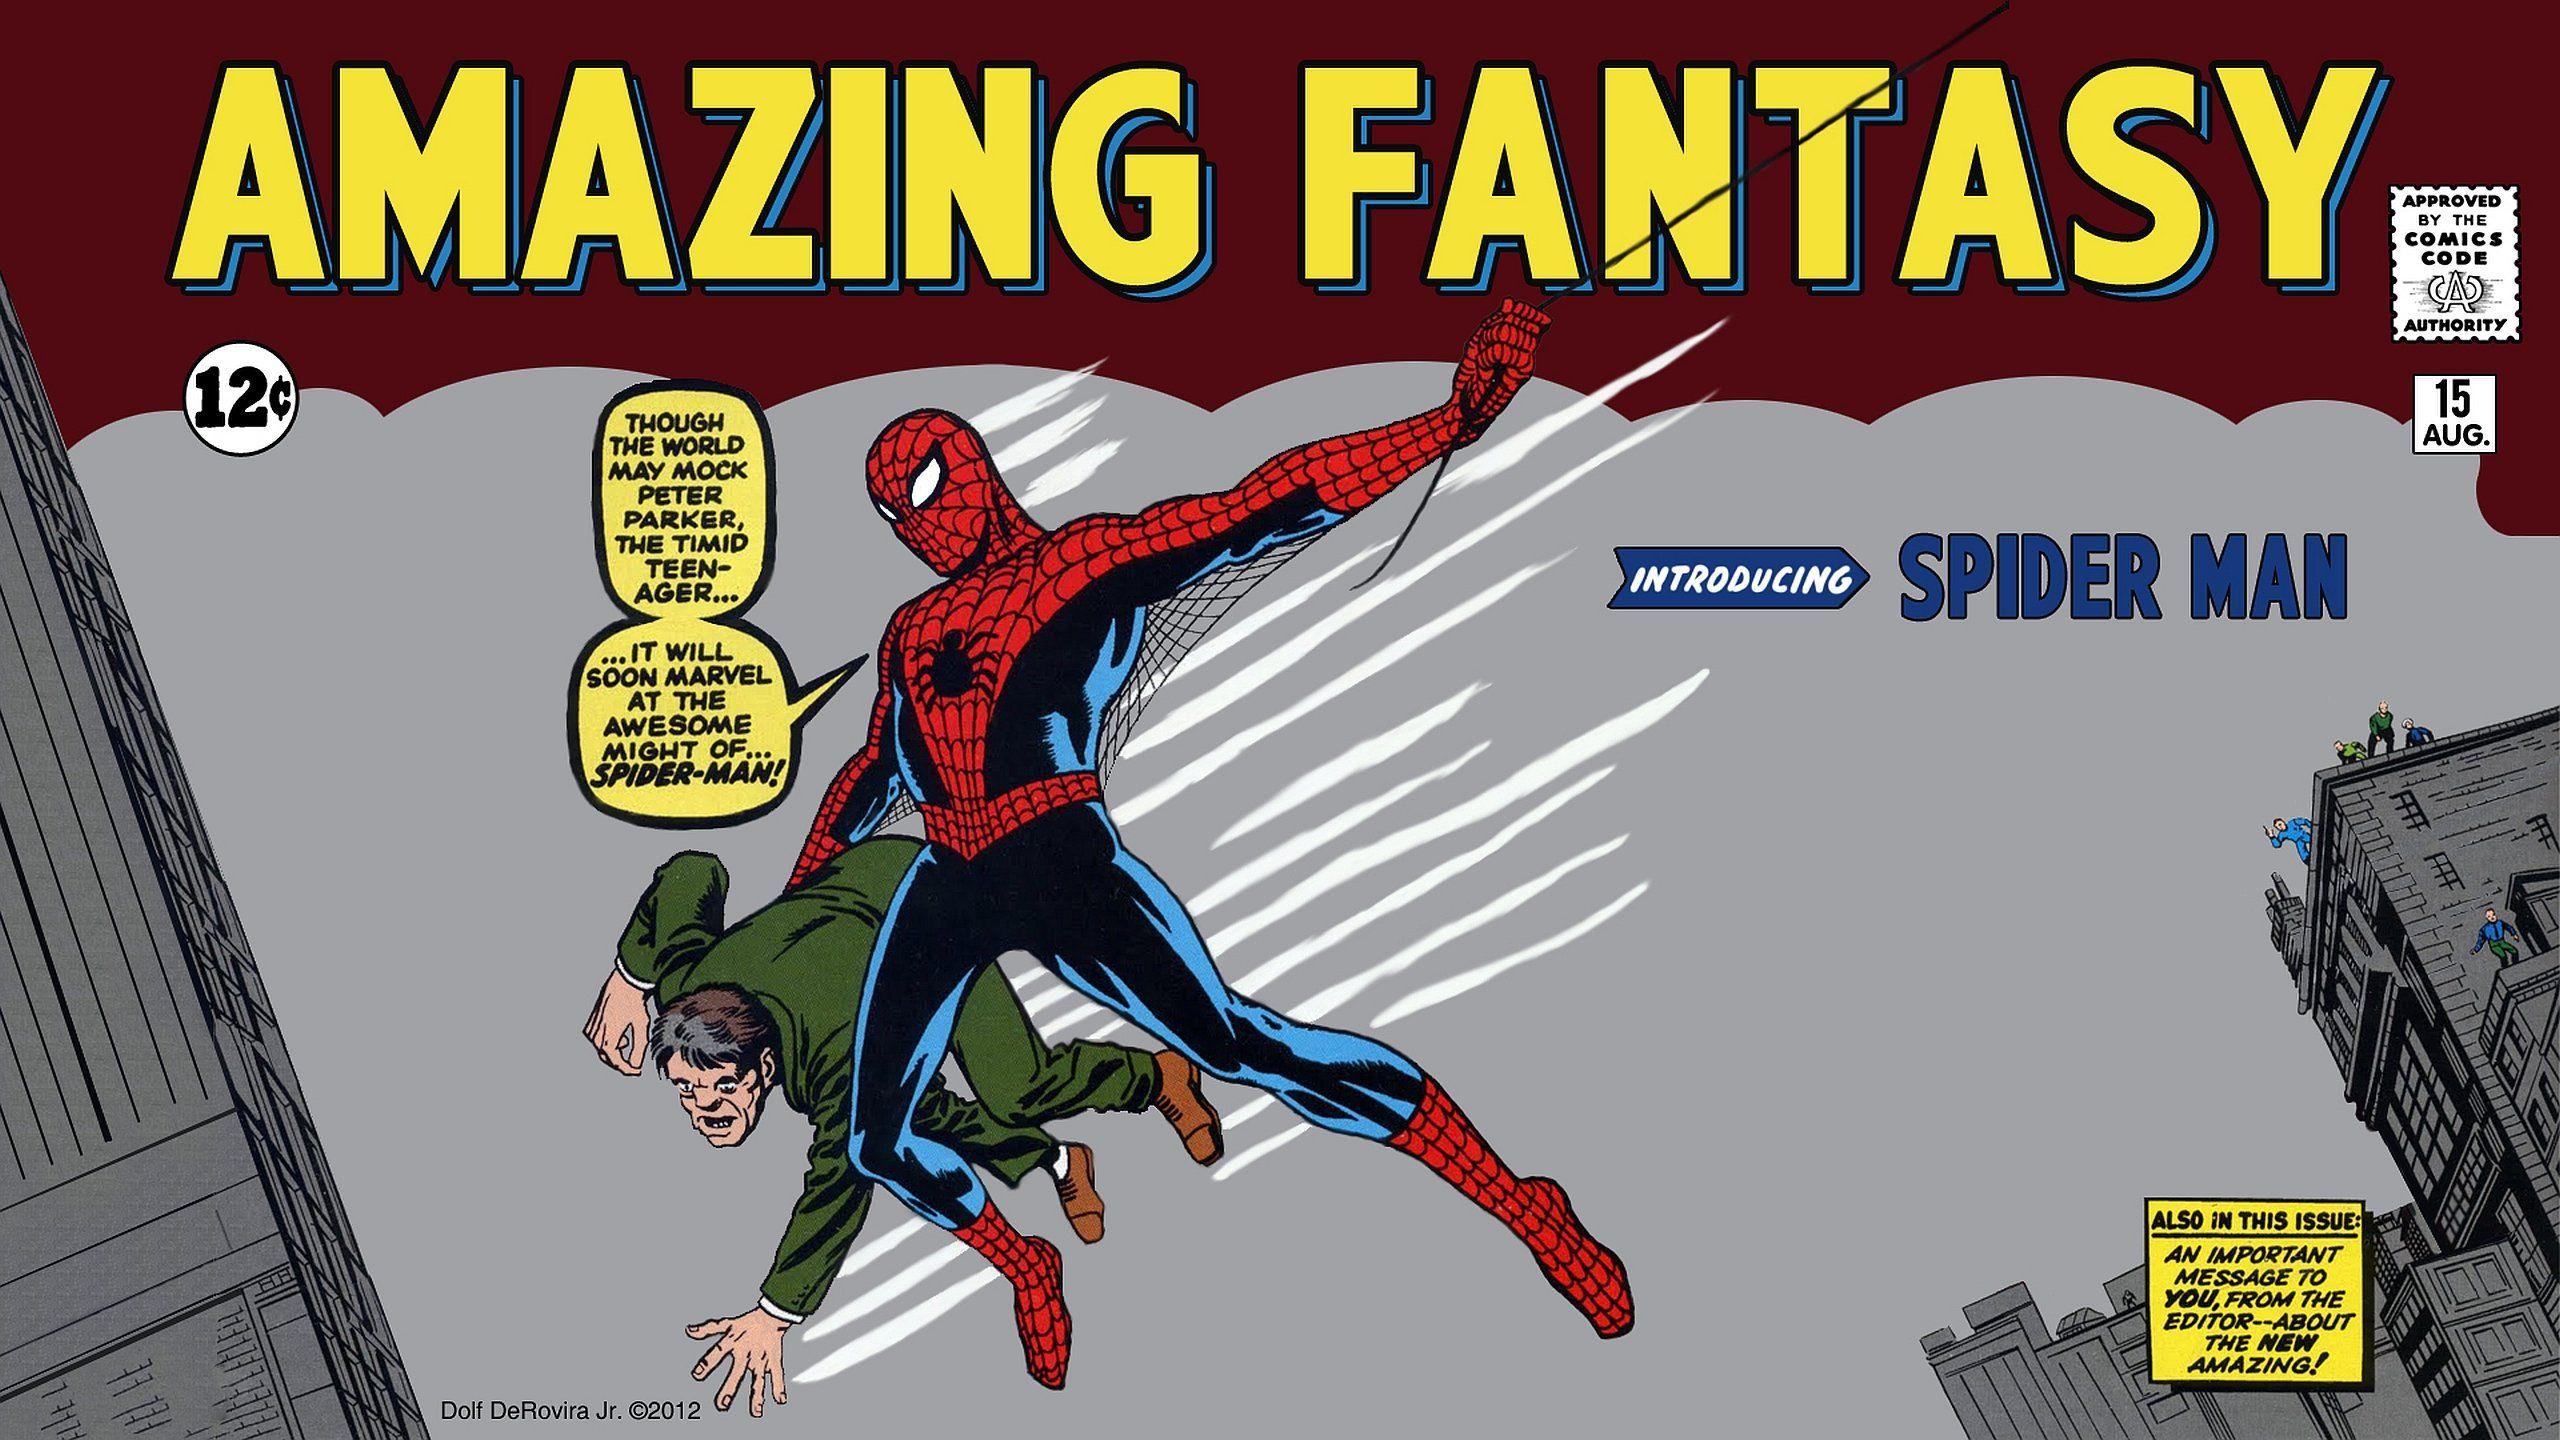 Spiderman, Amzing Fantasy